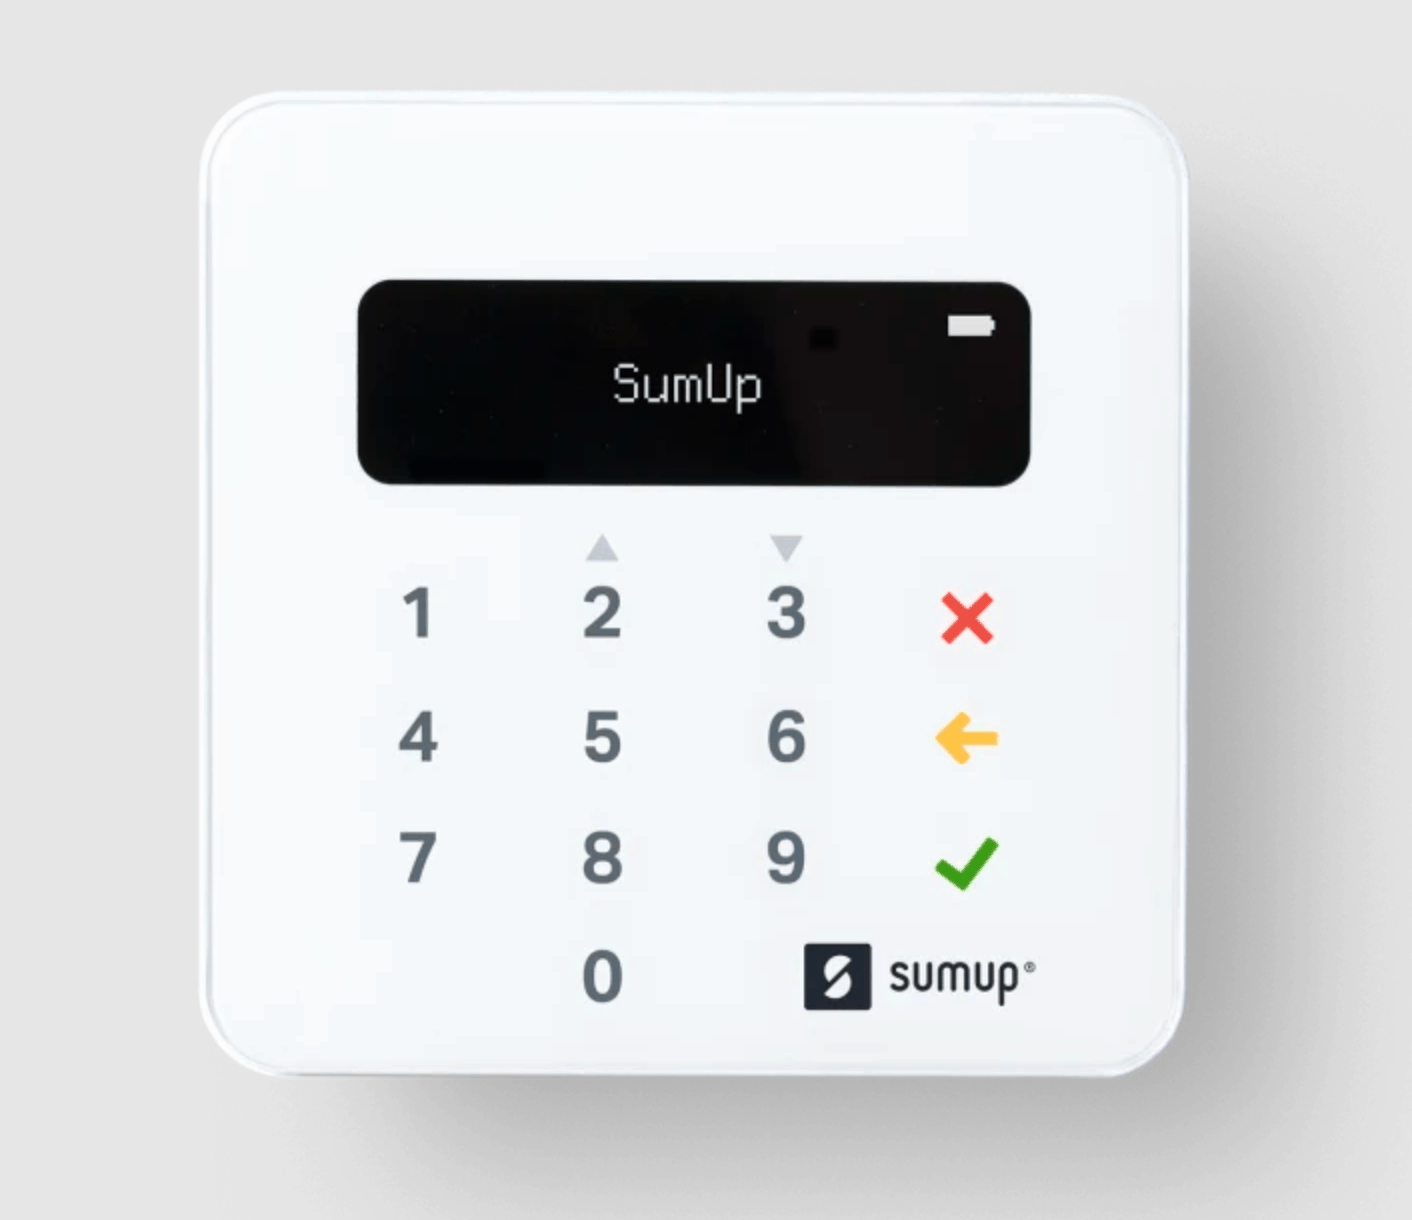 sumup plus card reader